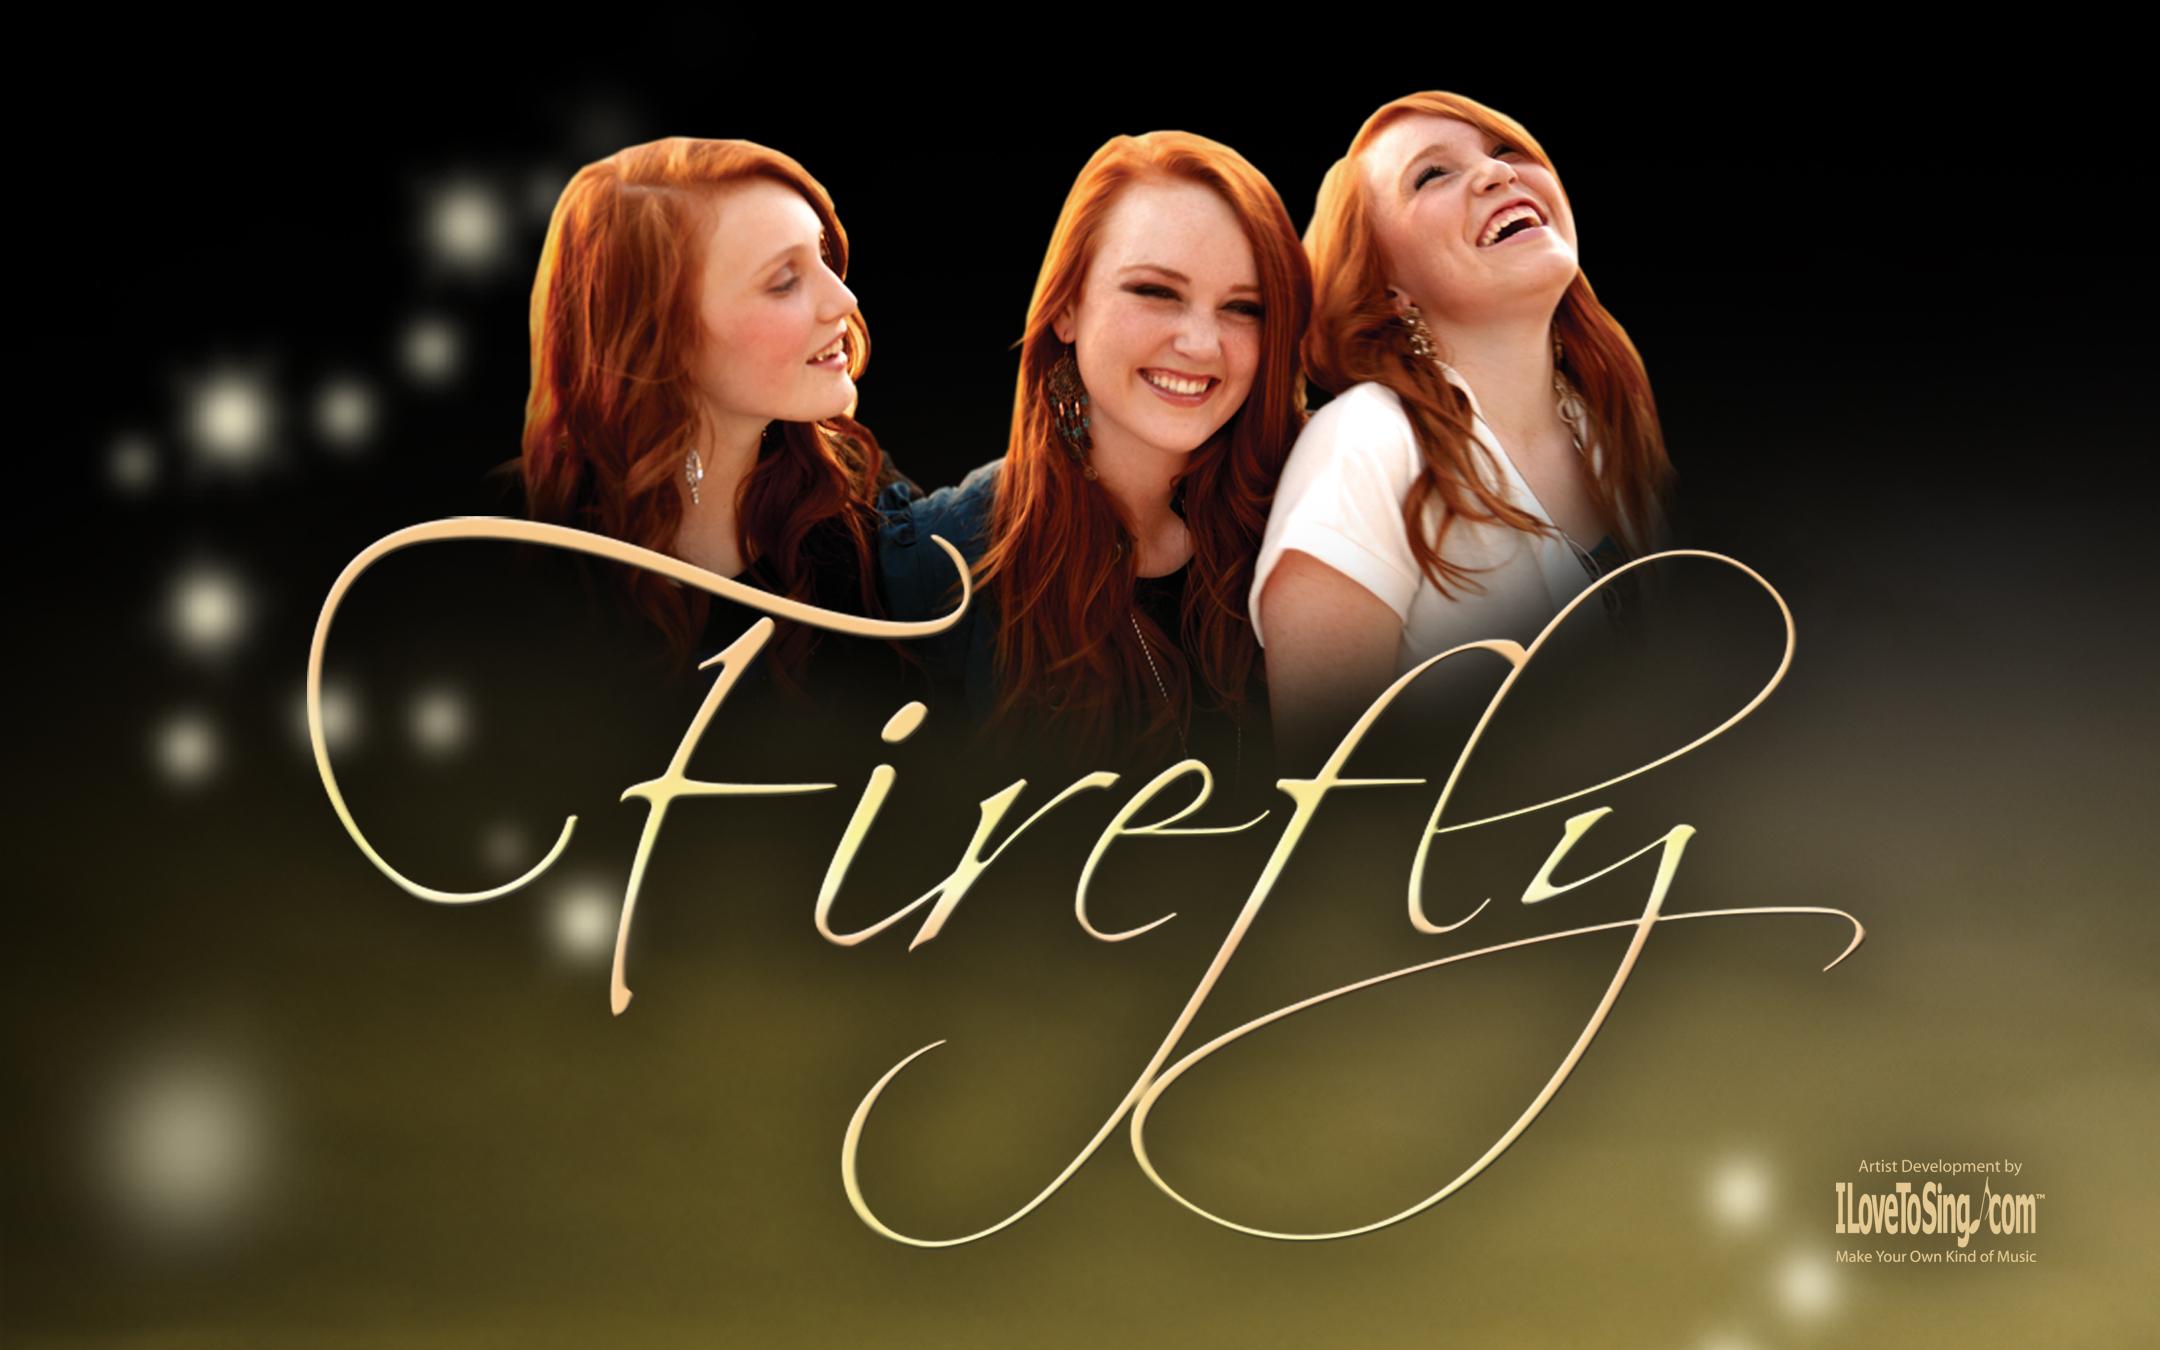 Firefly Desktop Wallpaper